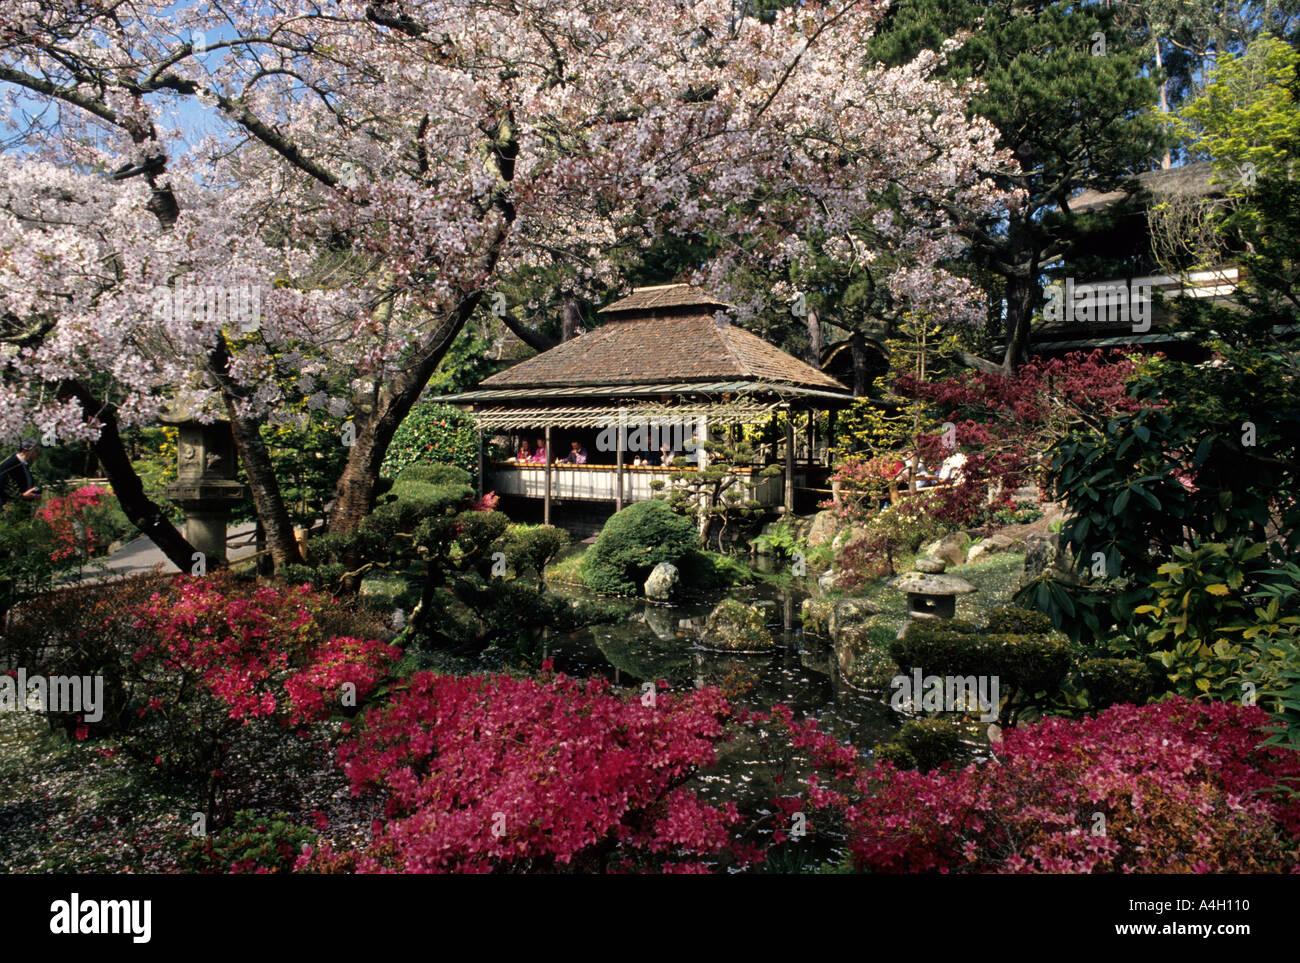 San Francisco California Tea Pavillion In The Japanese Tea Garden Stock Photo Royalty Free